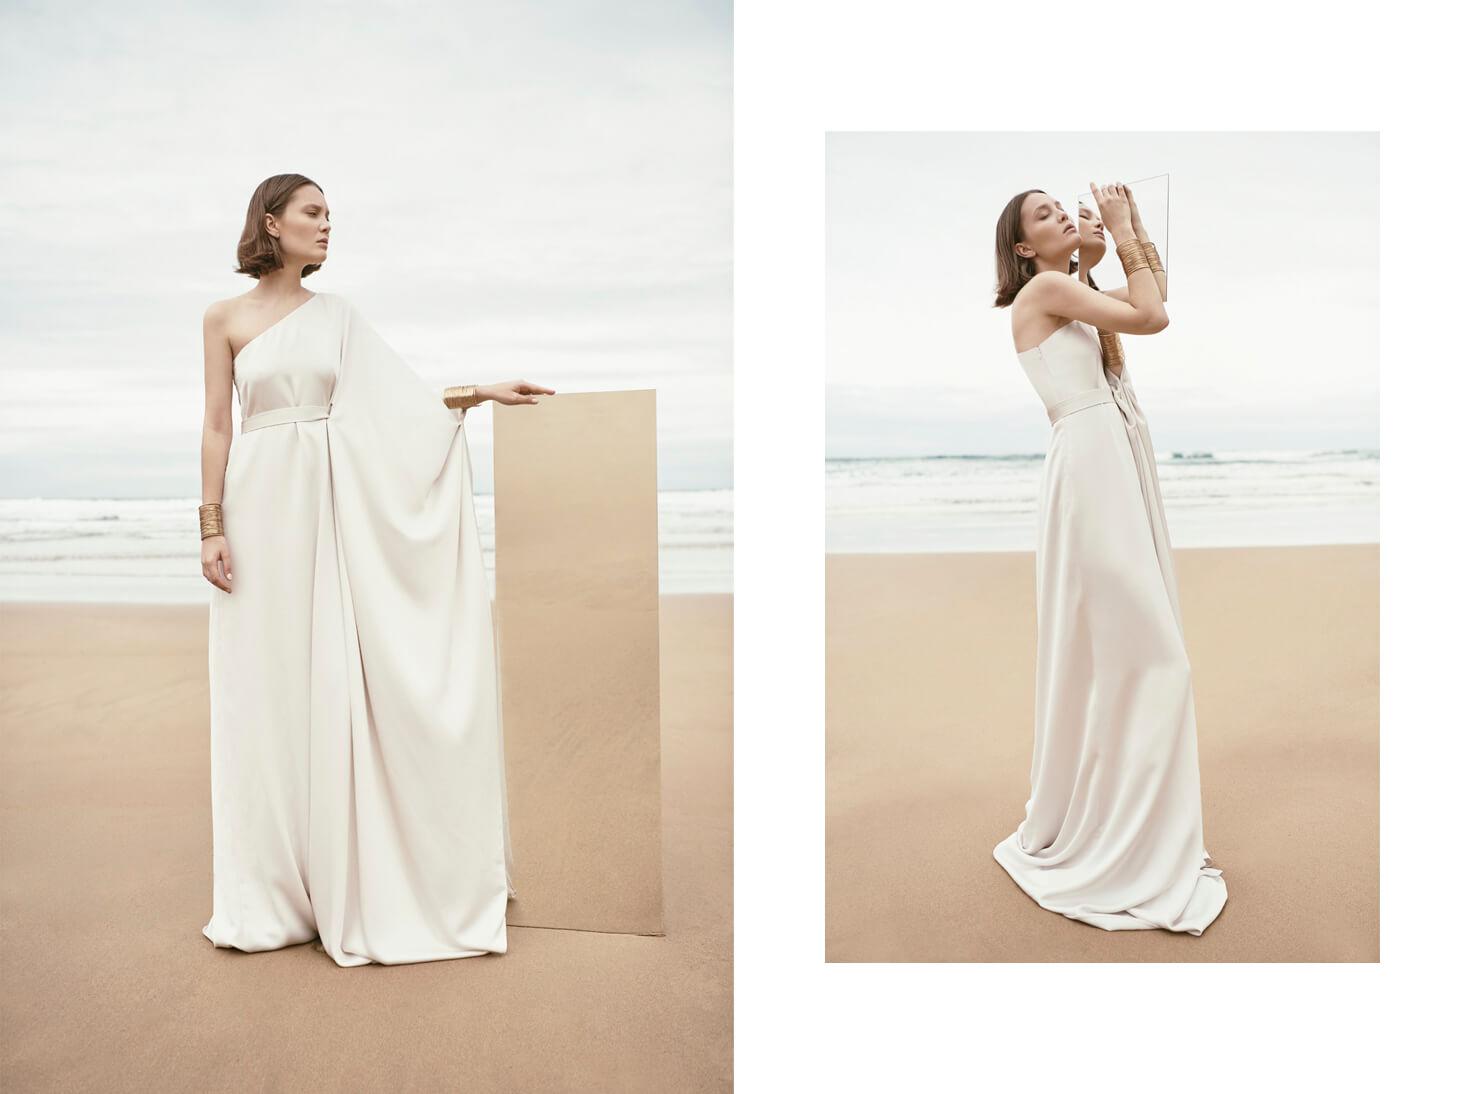 Monica-Cordera-Bridal-novia-2018-vestido-blanco-asimétrico